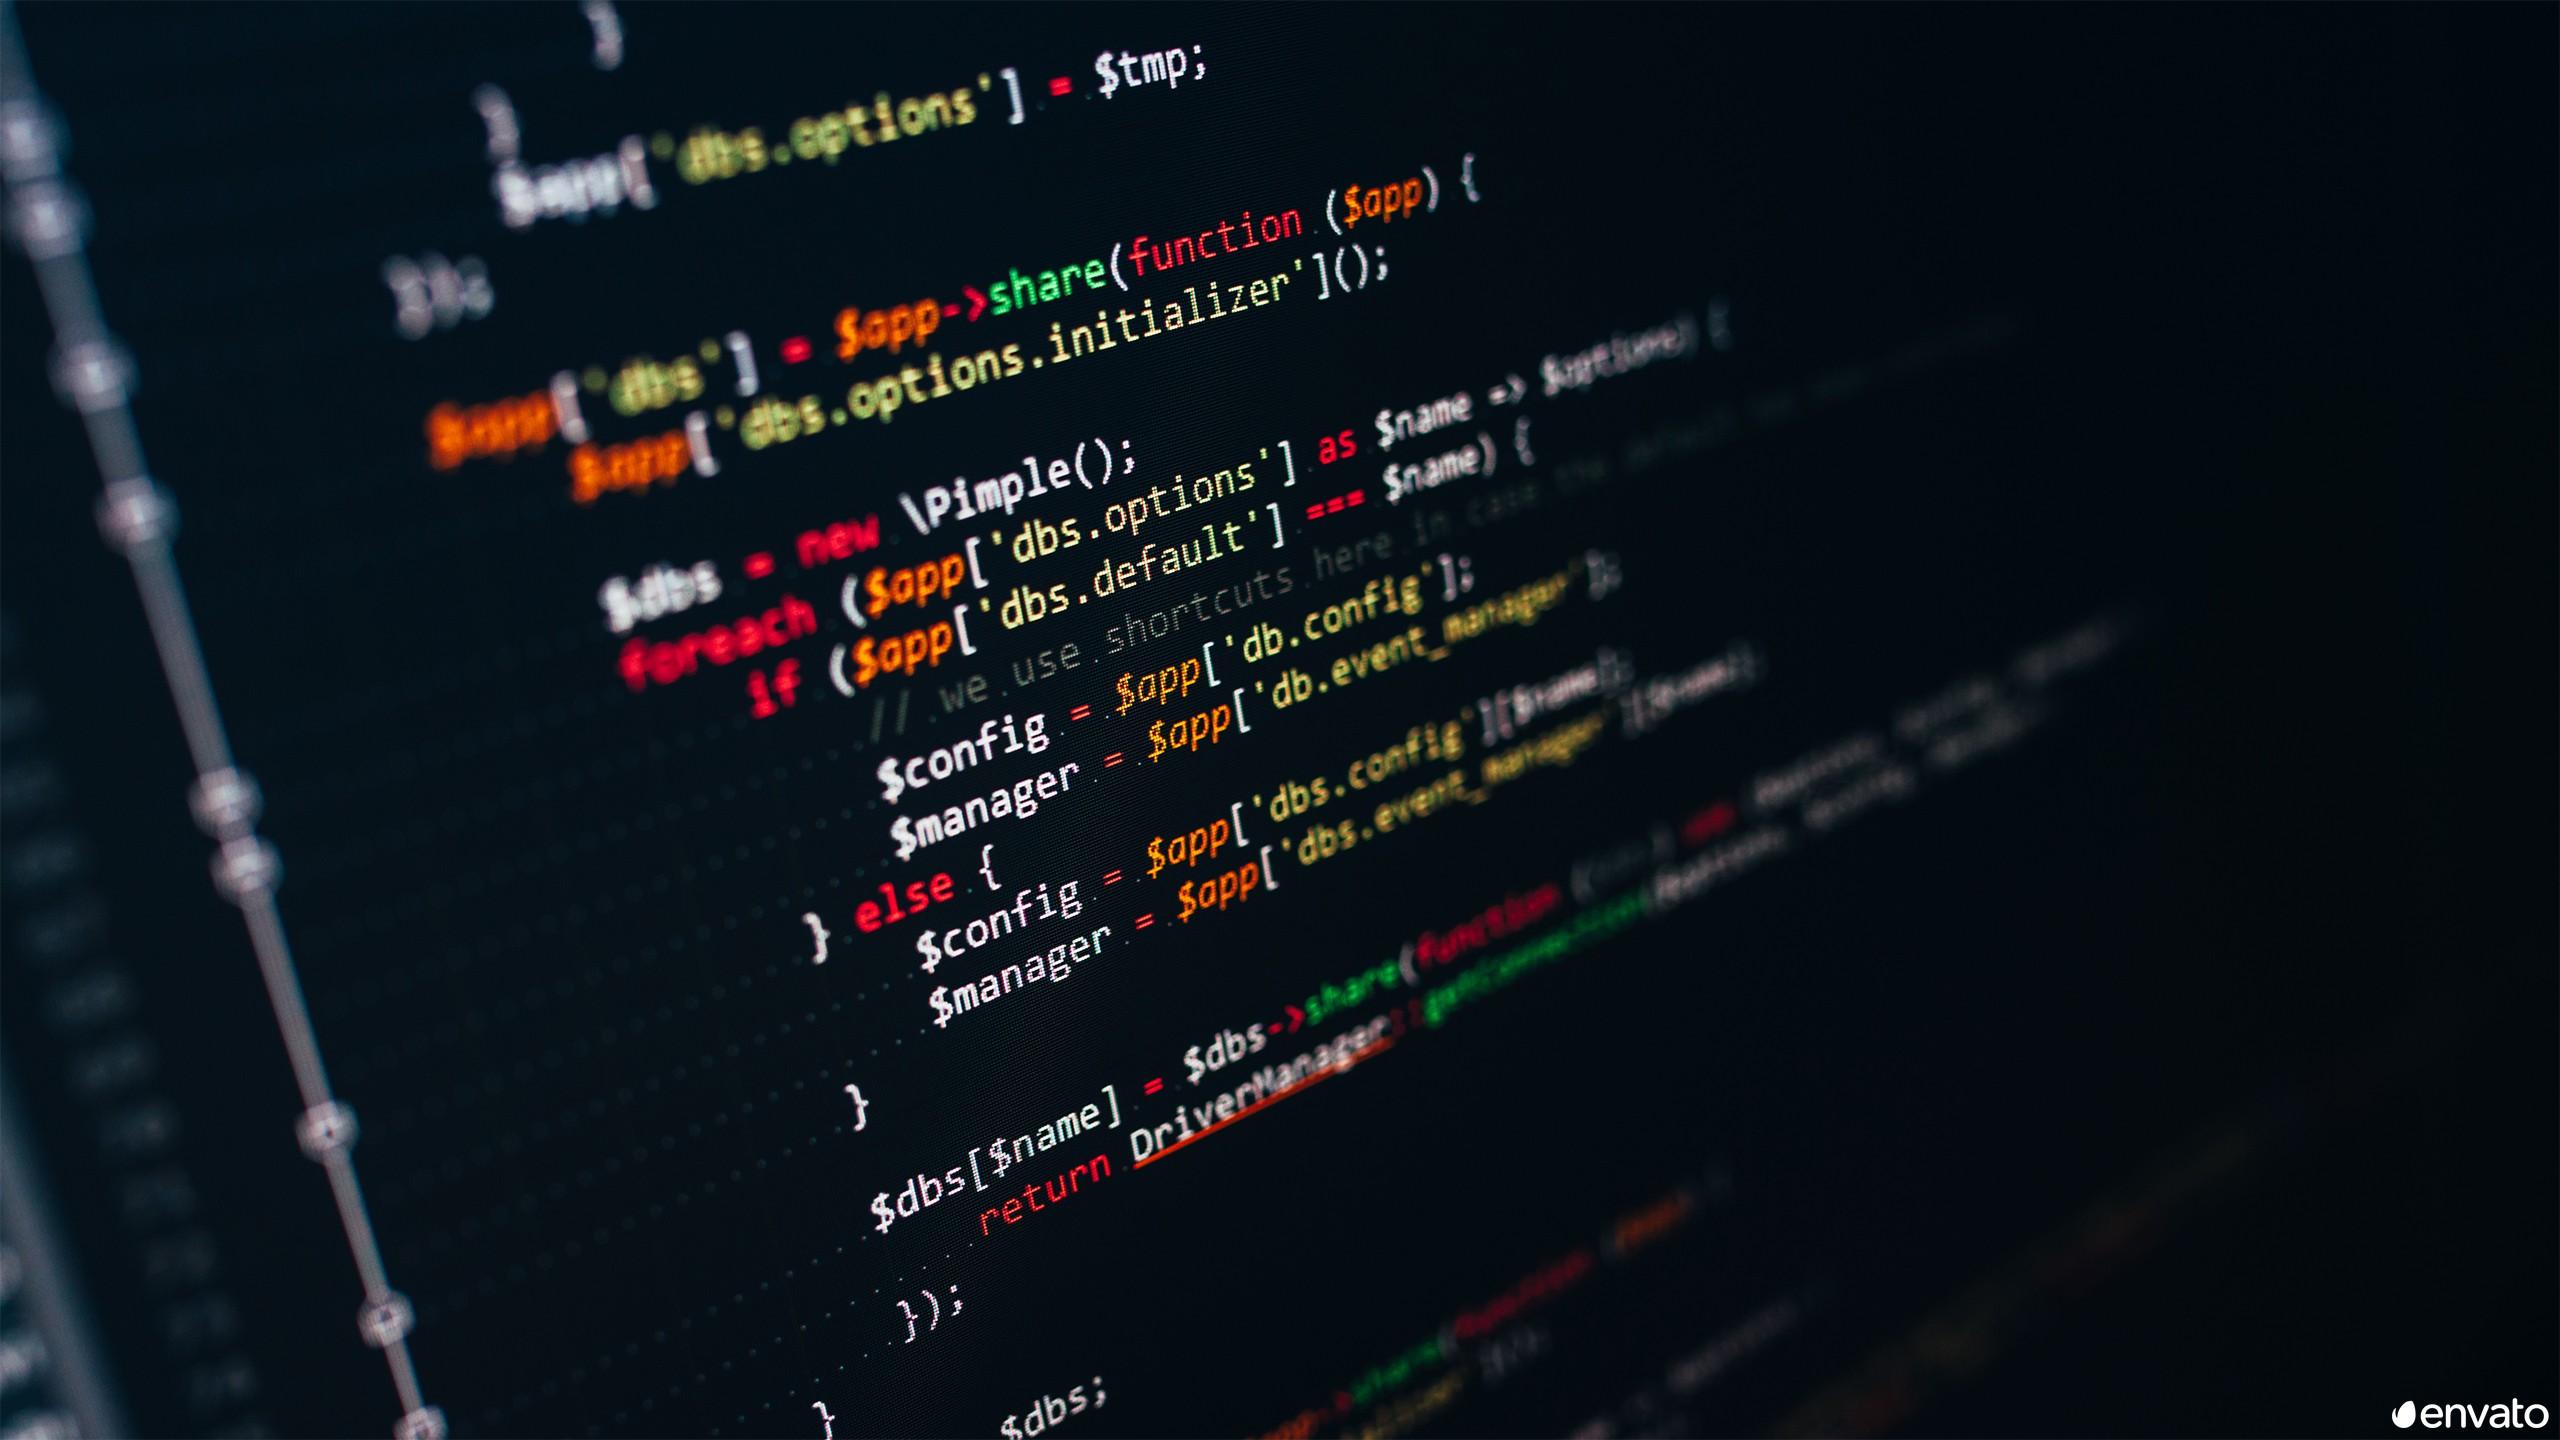 программа java для программирования на нокиа